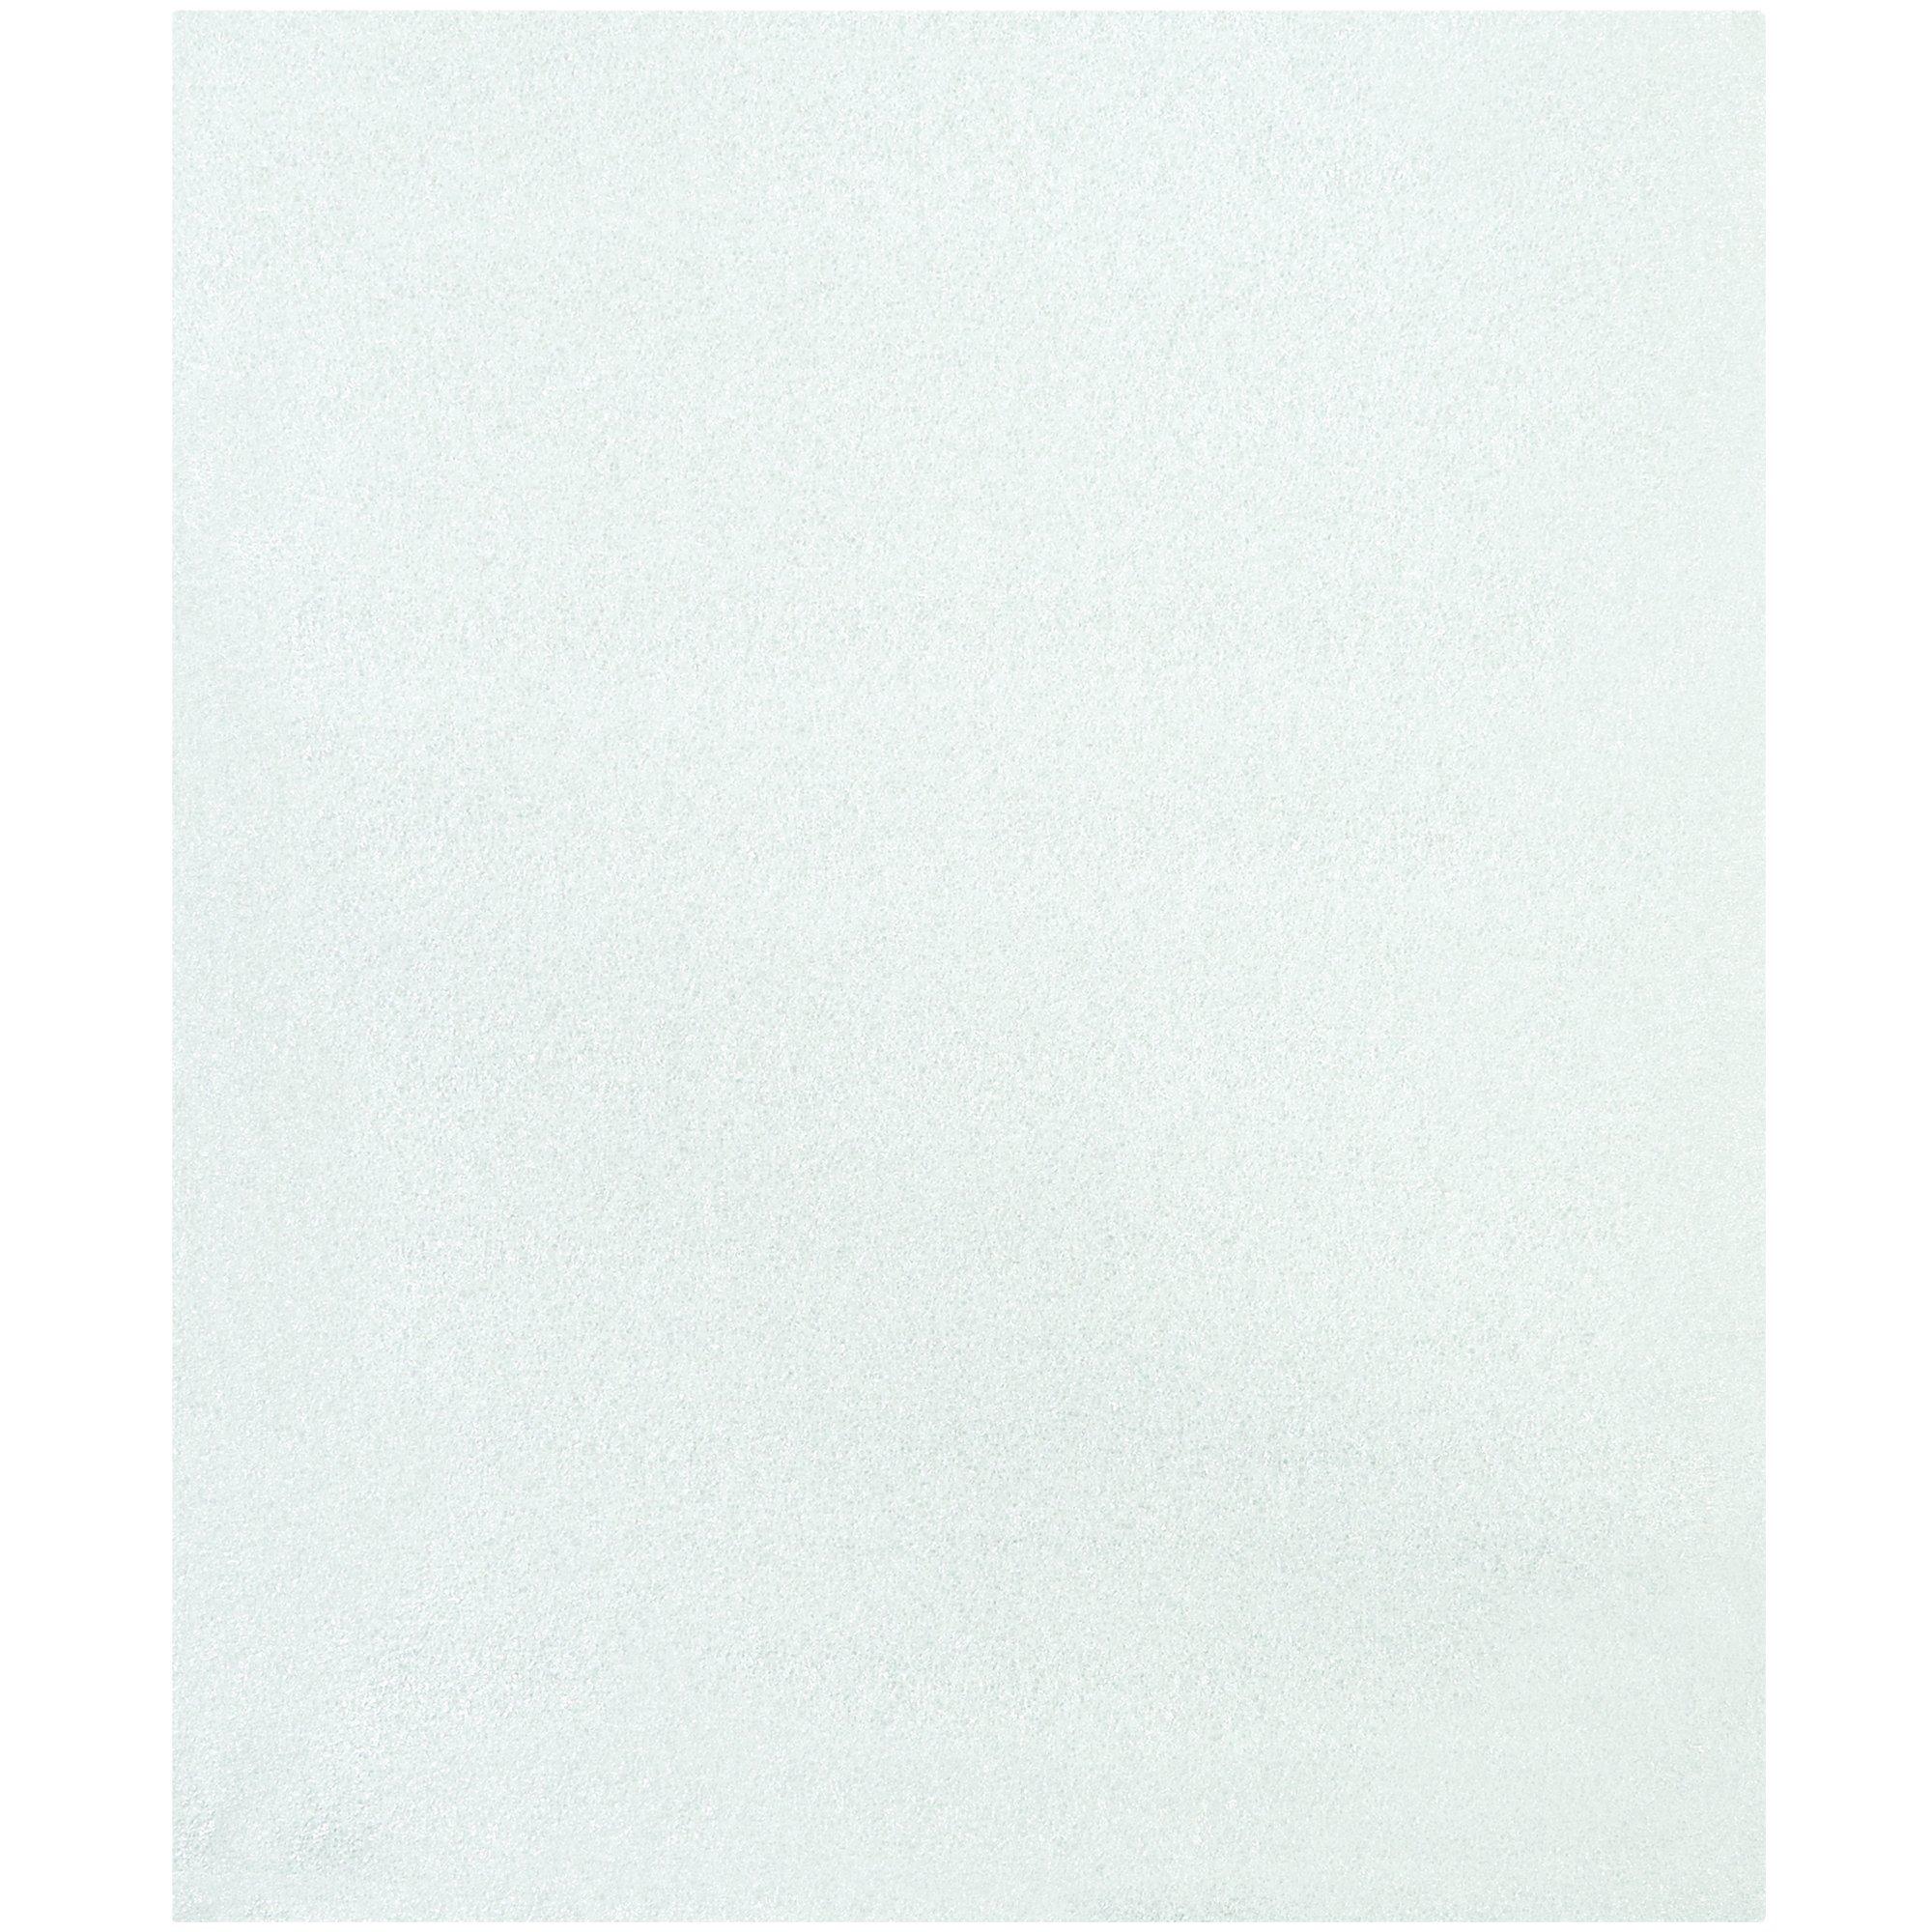 Aviditi Polyethylene Flush Cut Foam Pouch, 18'' L x 15'' W, White, Case of 75 (FP1518) by Aviditi